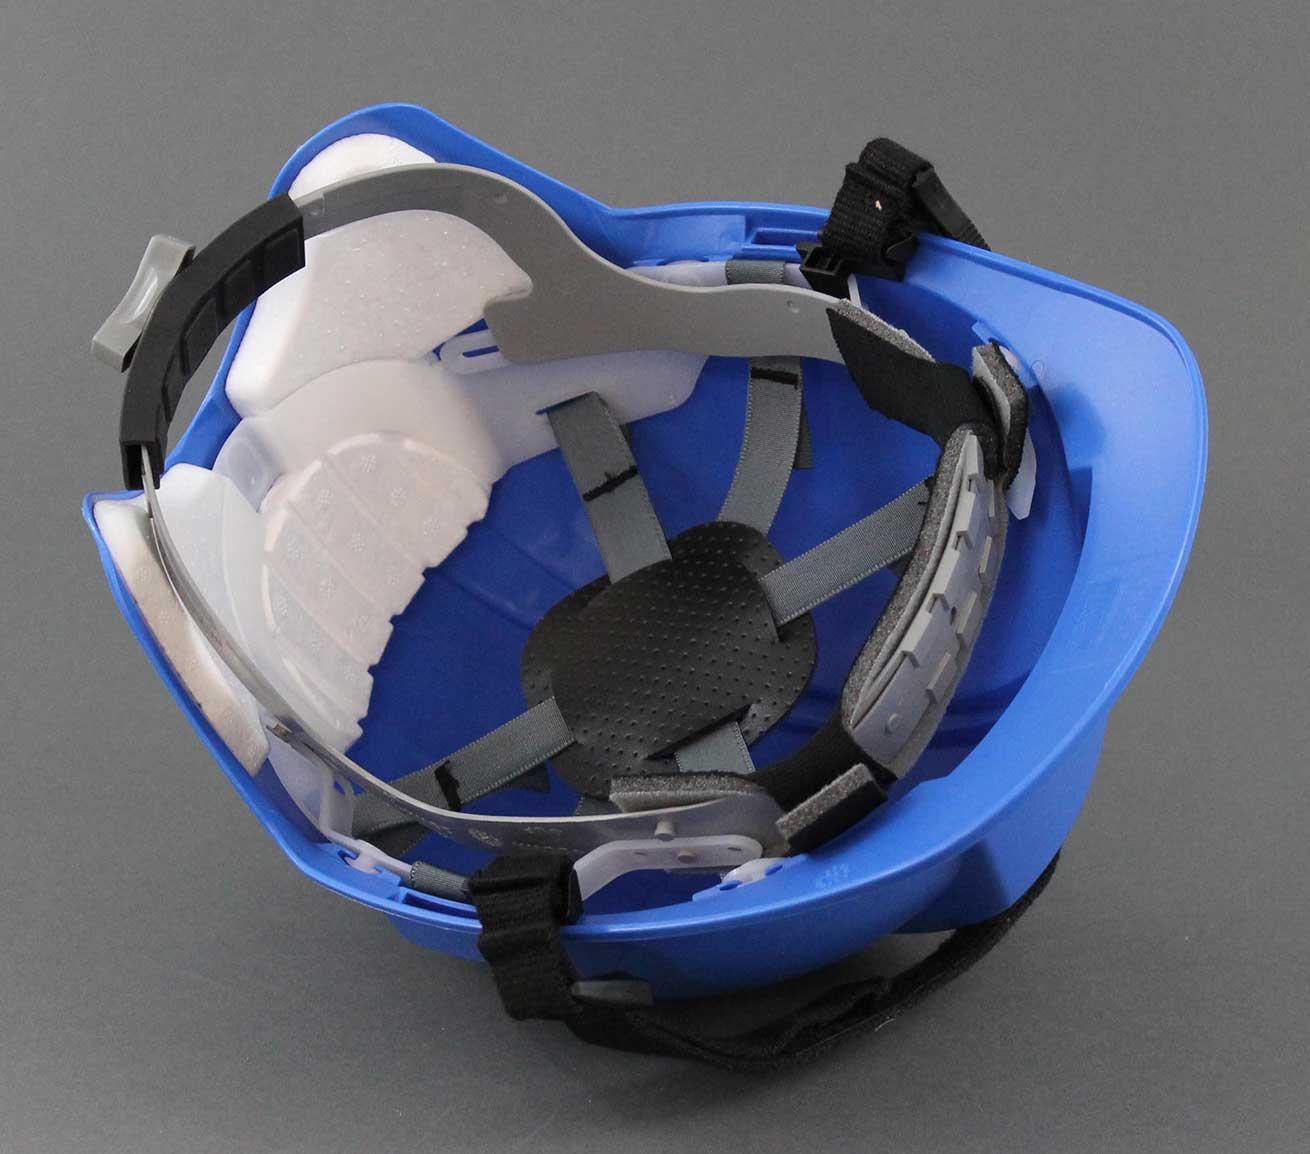 Safety Helmet Insert